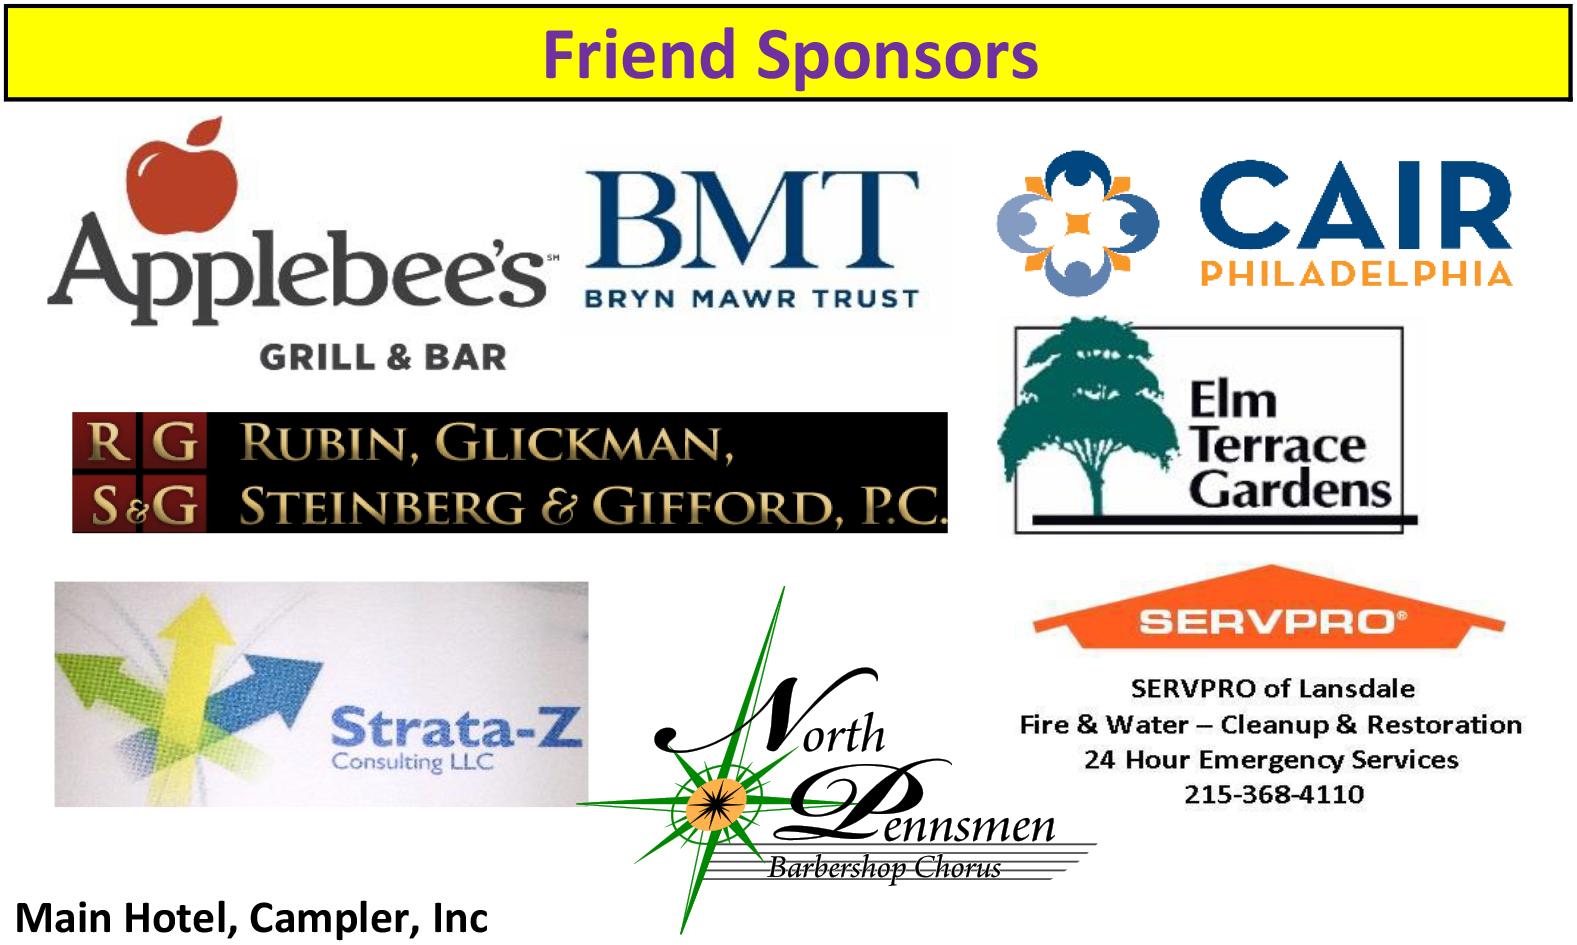 Website-sponsorship-Friend1